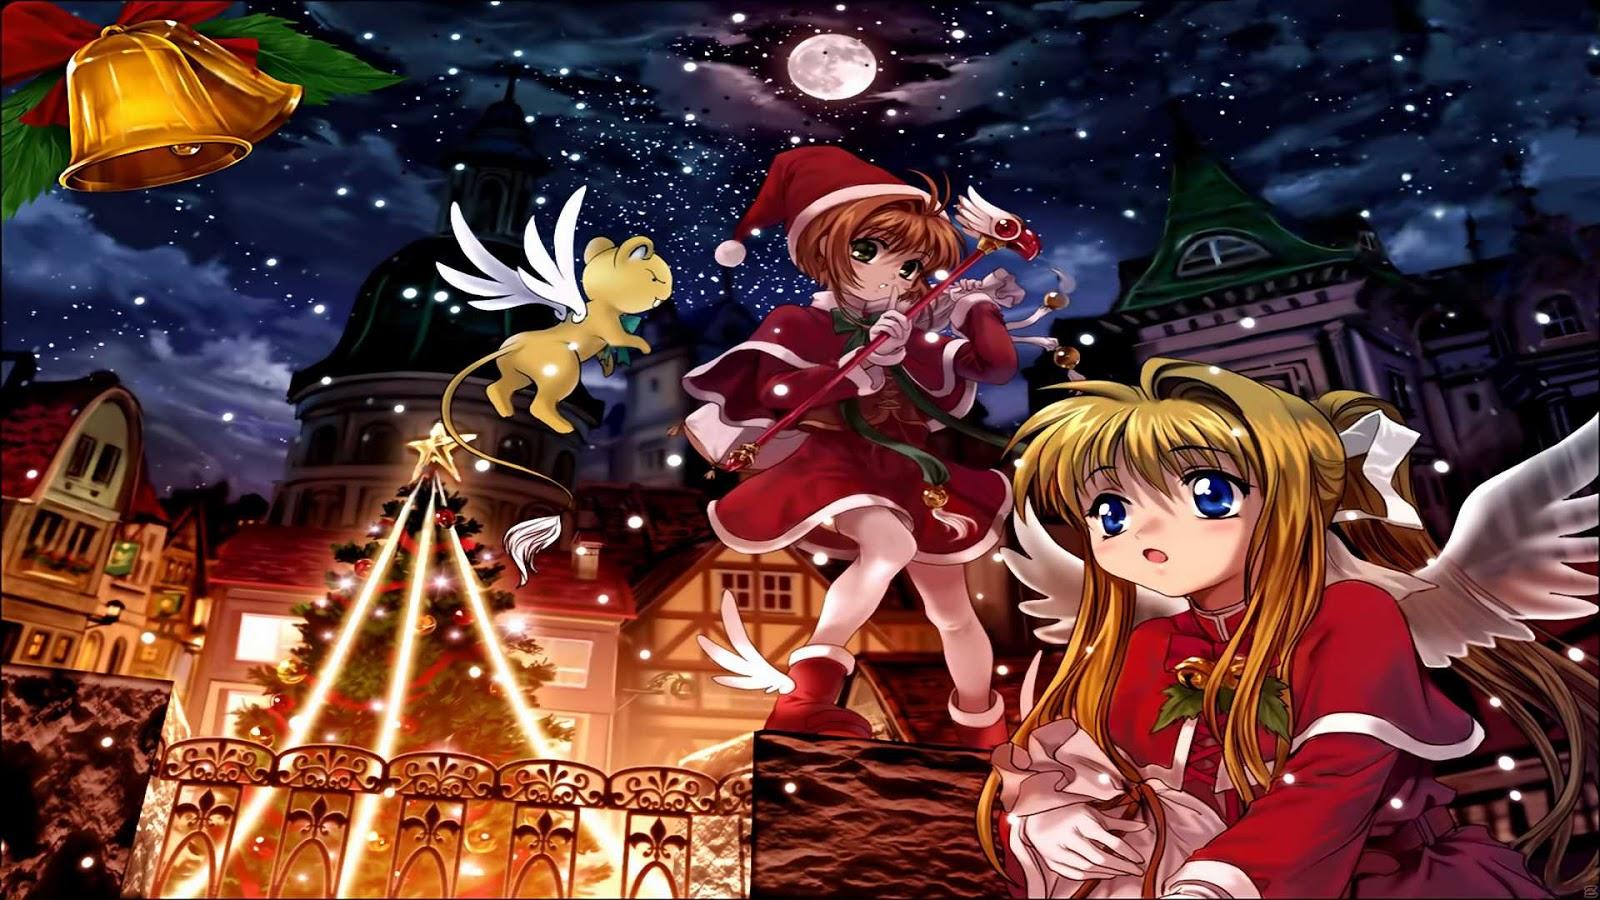 http://1.bp.blogspot.com/-77u-4PaMkd0/UNzNo49tPhI/AAAAAAAA0Qg/ANrHfvI3l2w/s1600/Wallpapers+Navidad+Anime+-+Merry+Christmas(1)+-+1920x1080.jpg